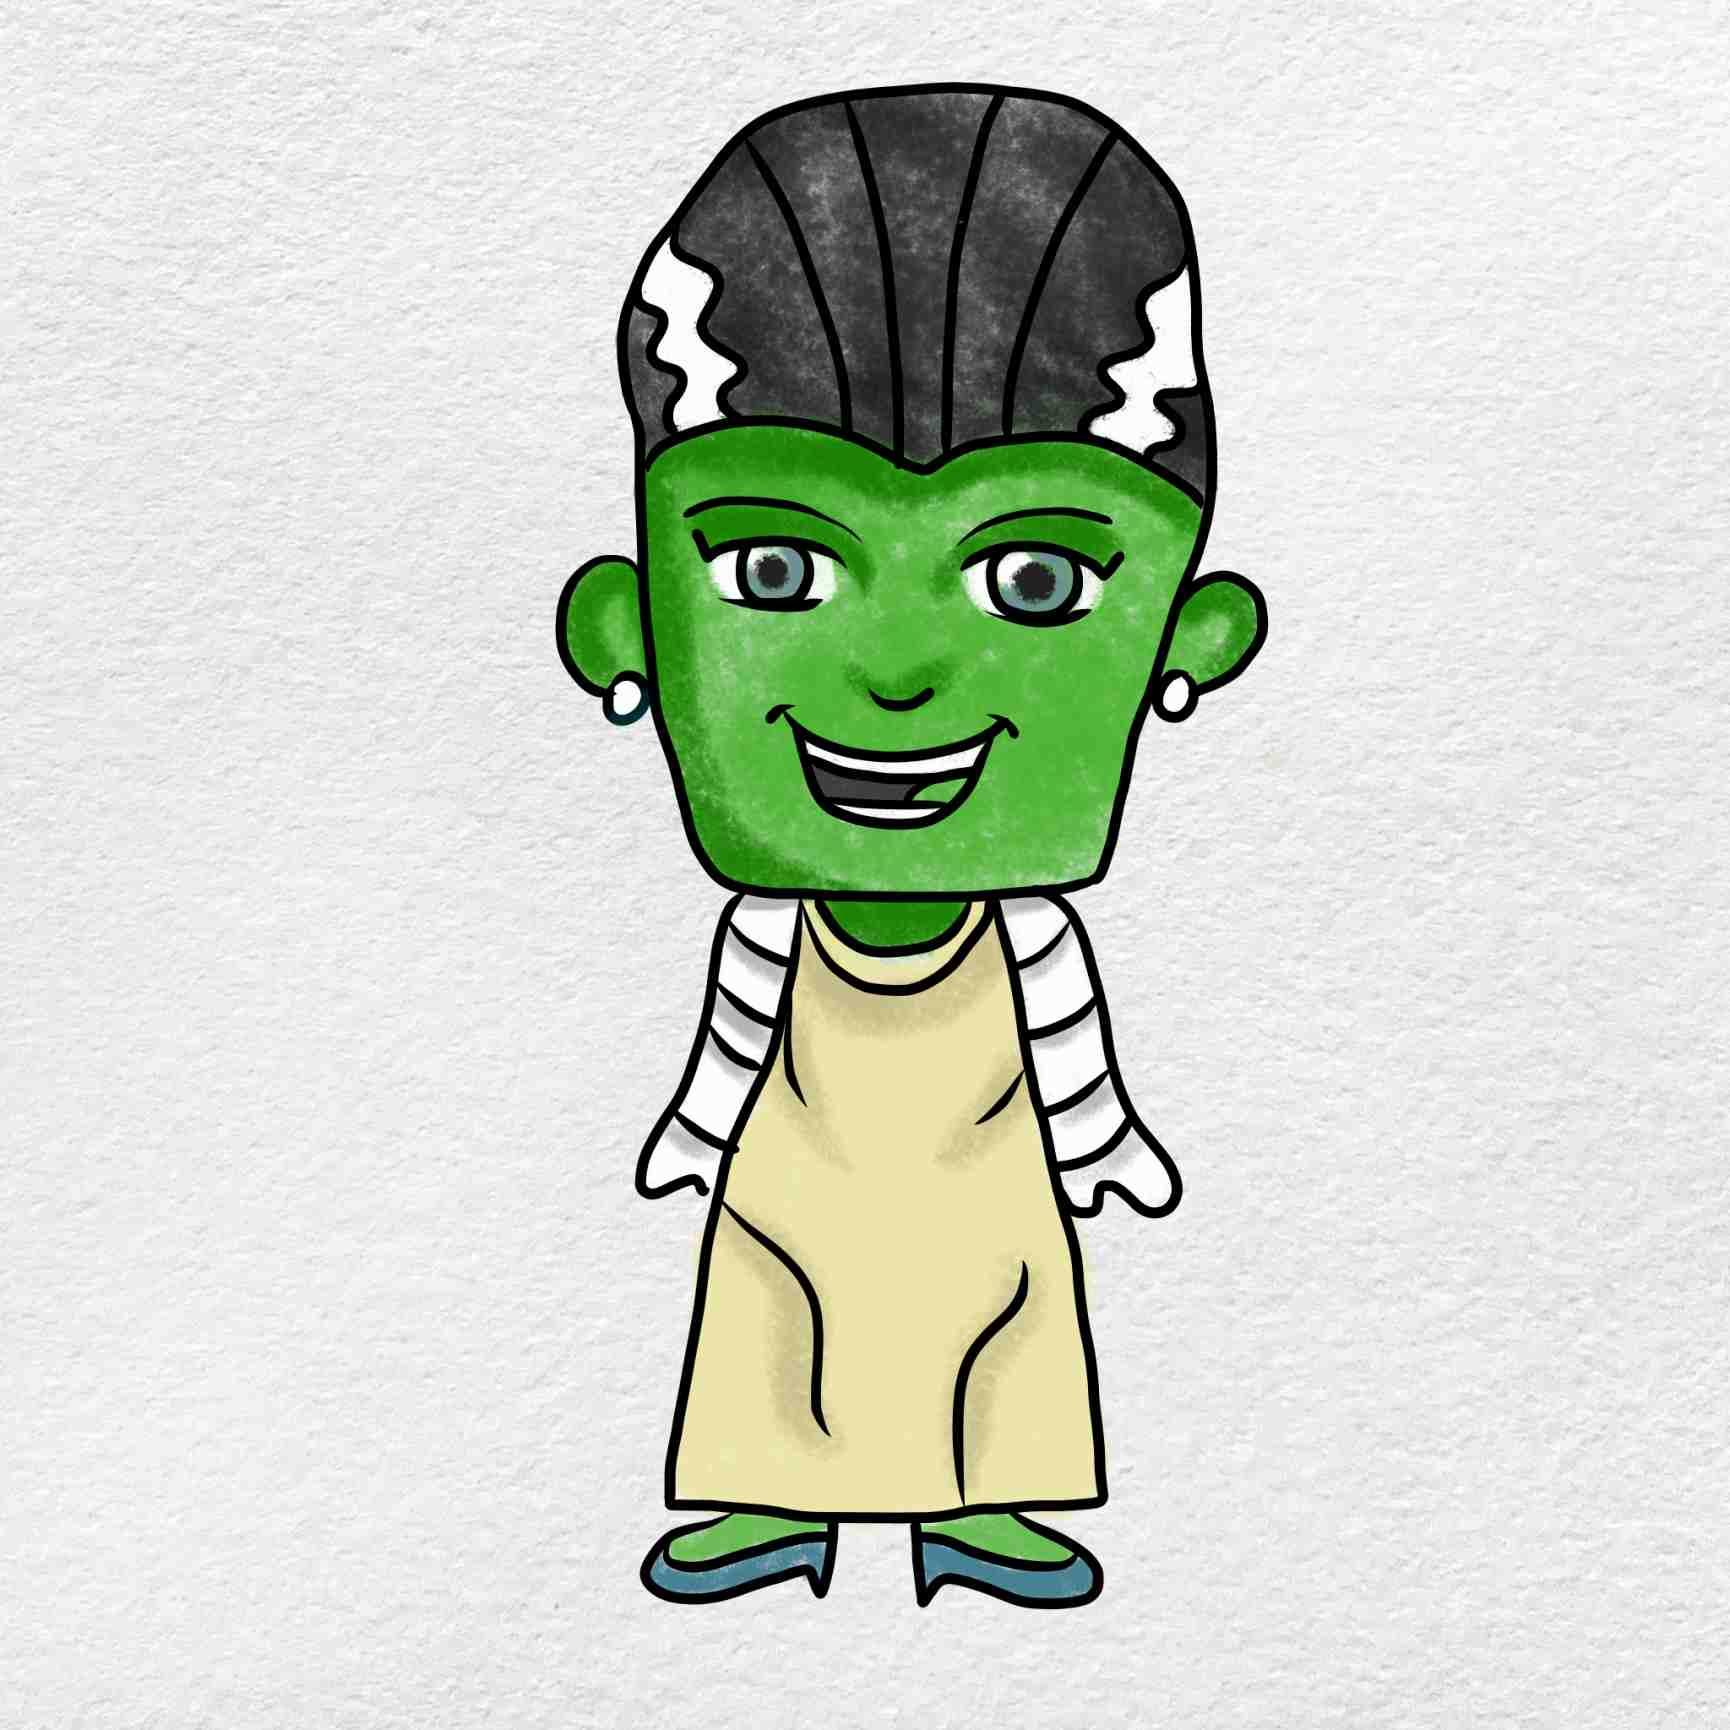 Bride Of Frankenstein Drawing: Step 6